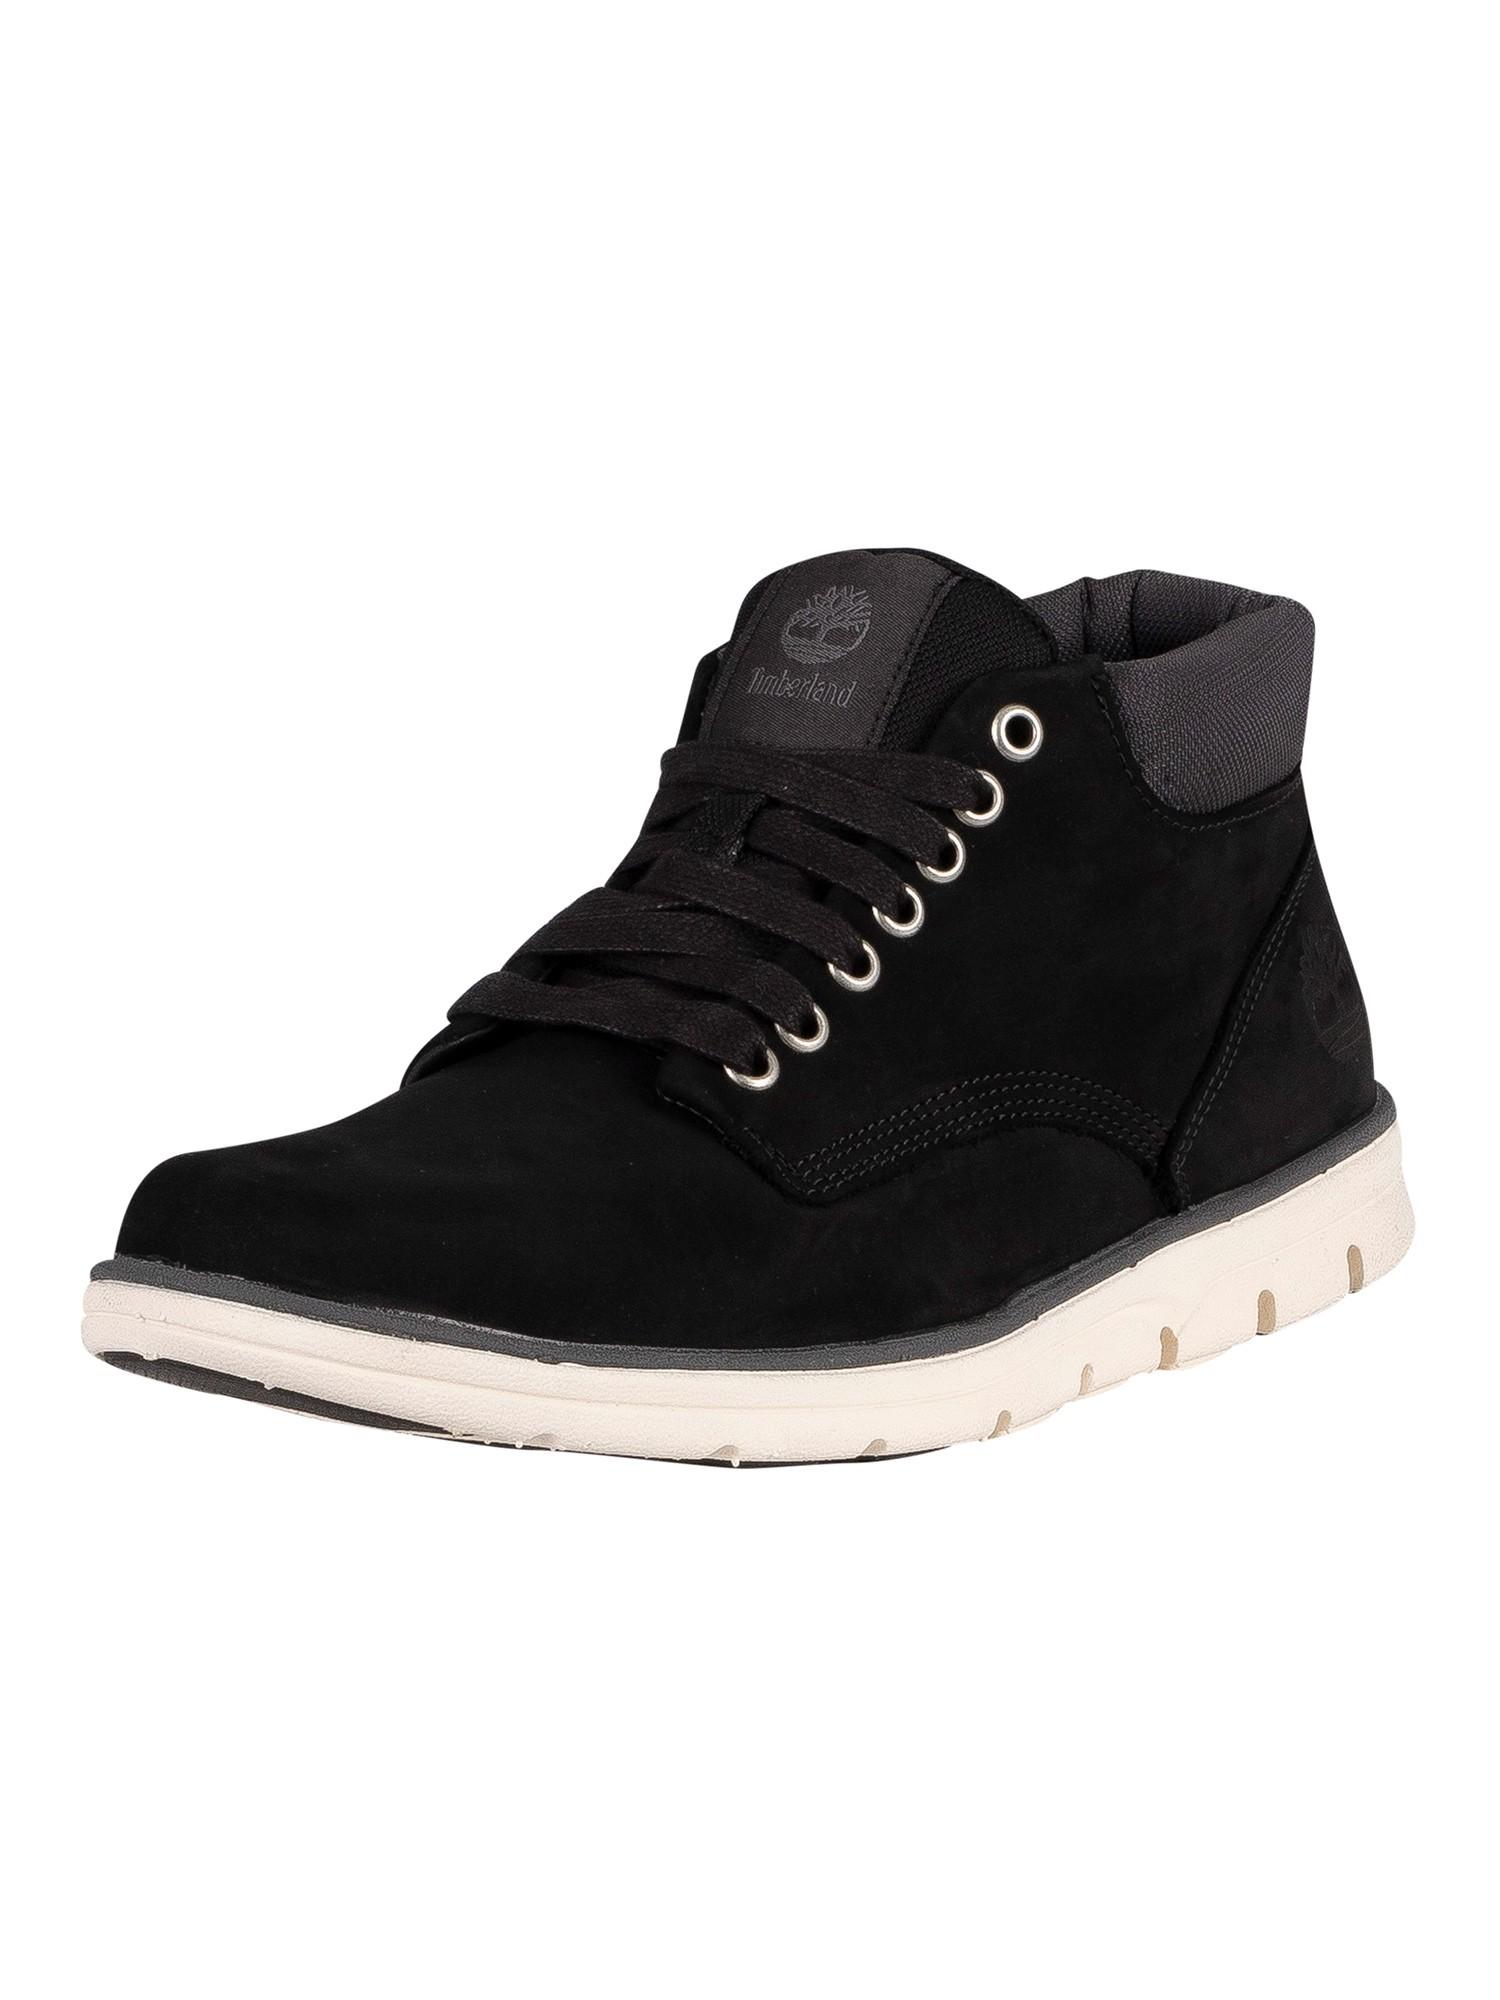 Bradstreet Chukka Leather Boots